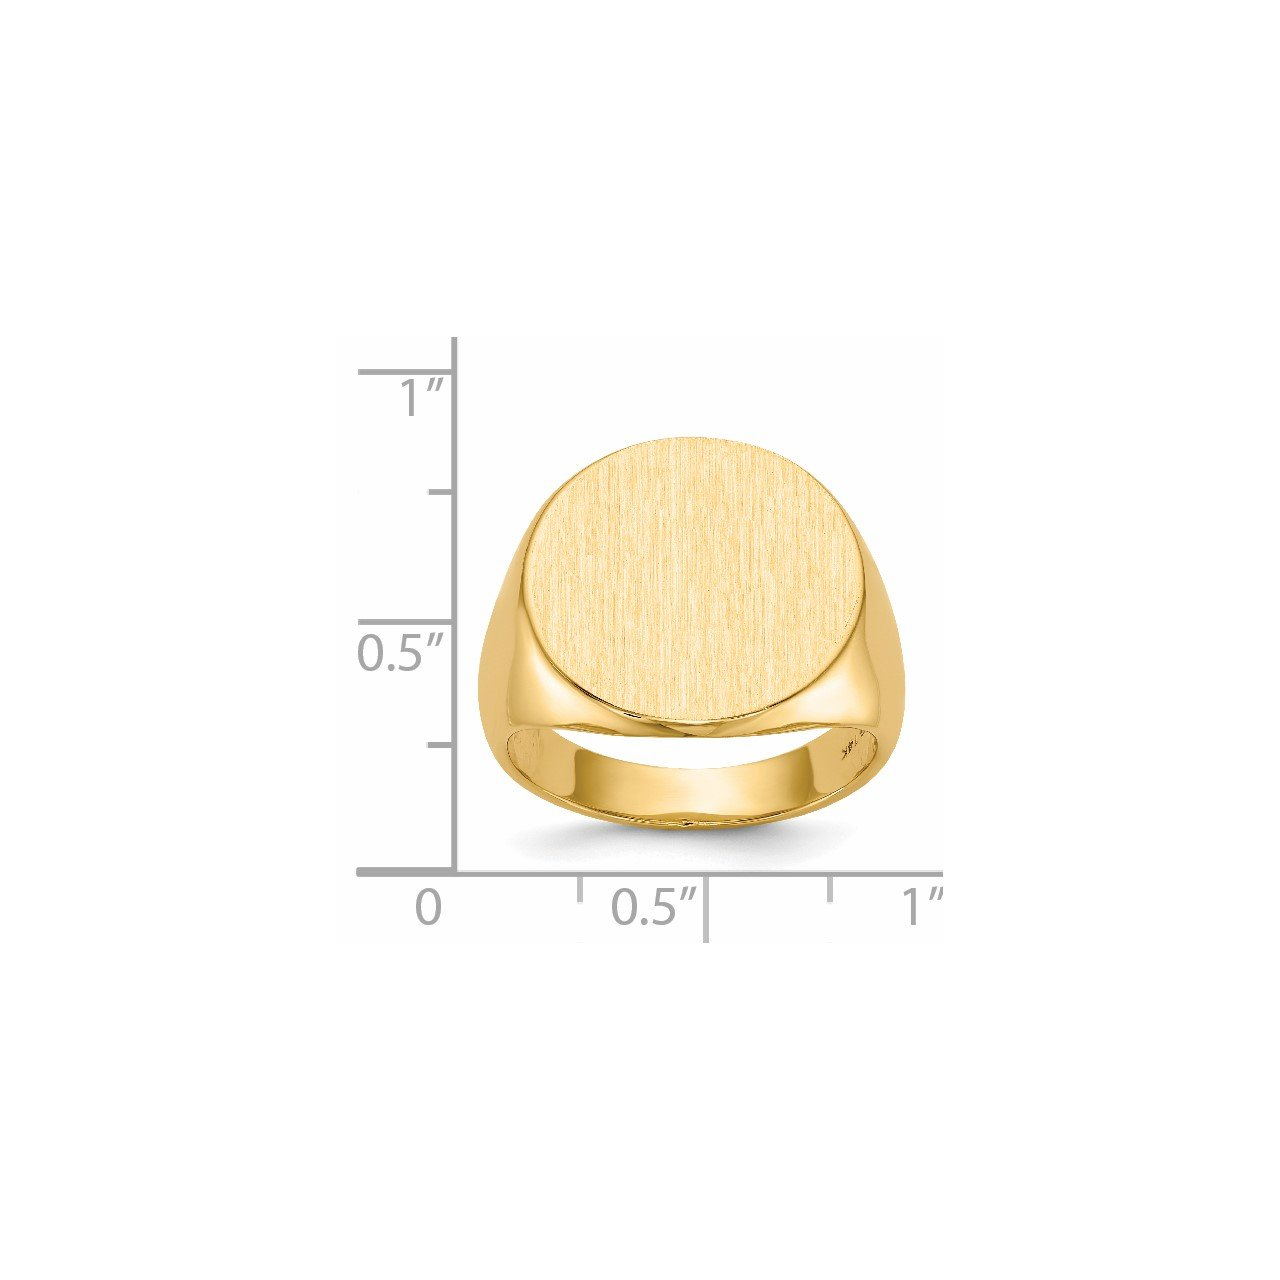 14k 17.5x18.0mm Closed Back Men's Signet Ring-4